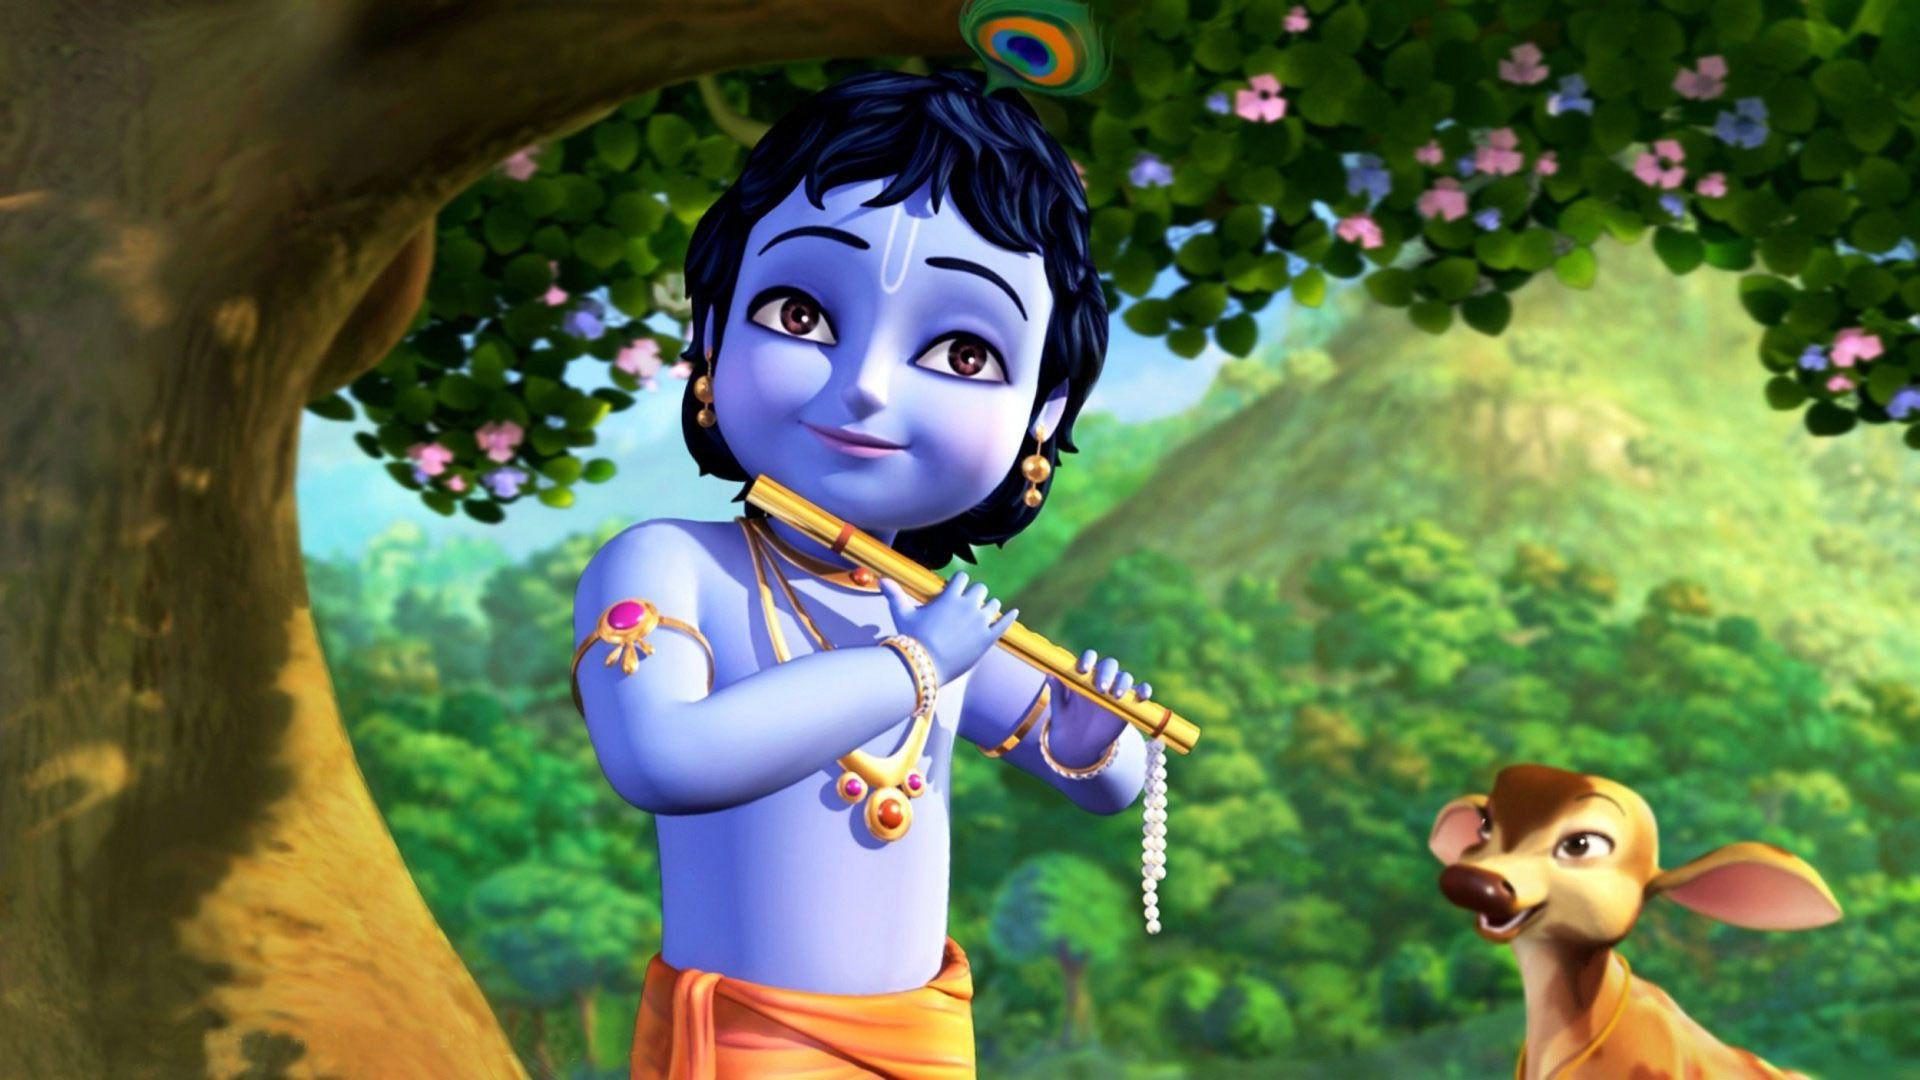 jai shri krishna cartoons krishna cartoon wallpaper hd lord krishna wallpapers pinterest